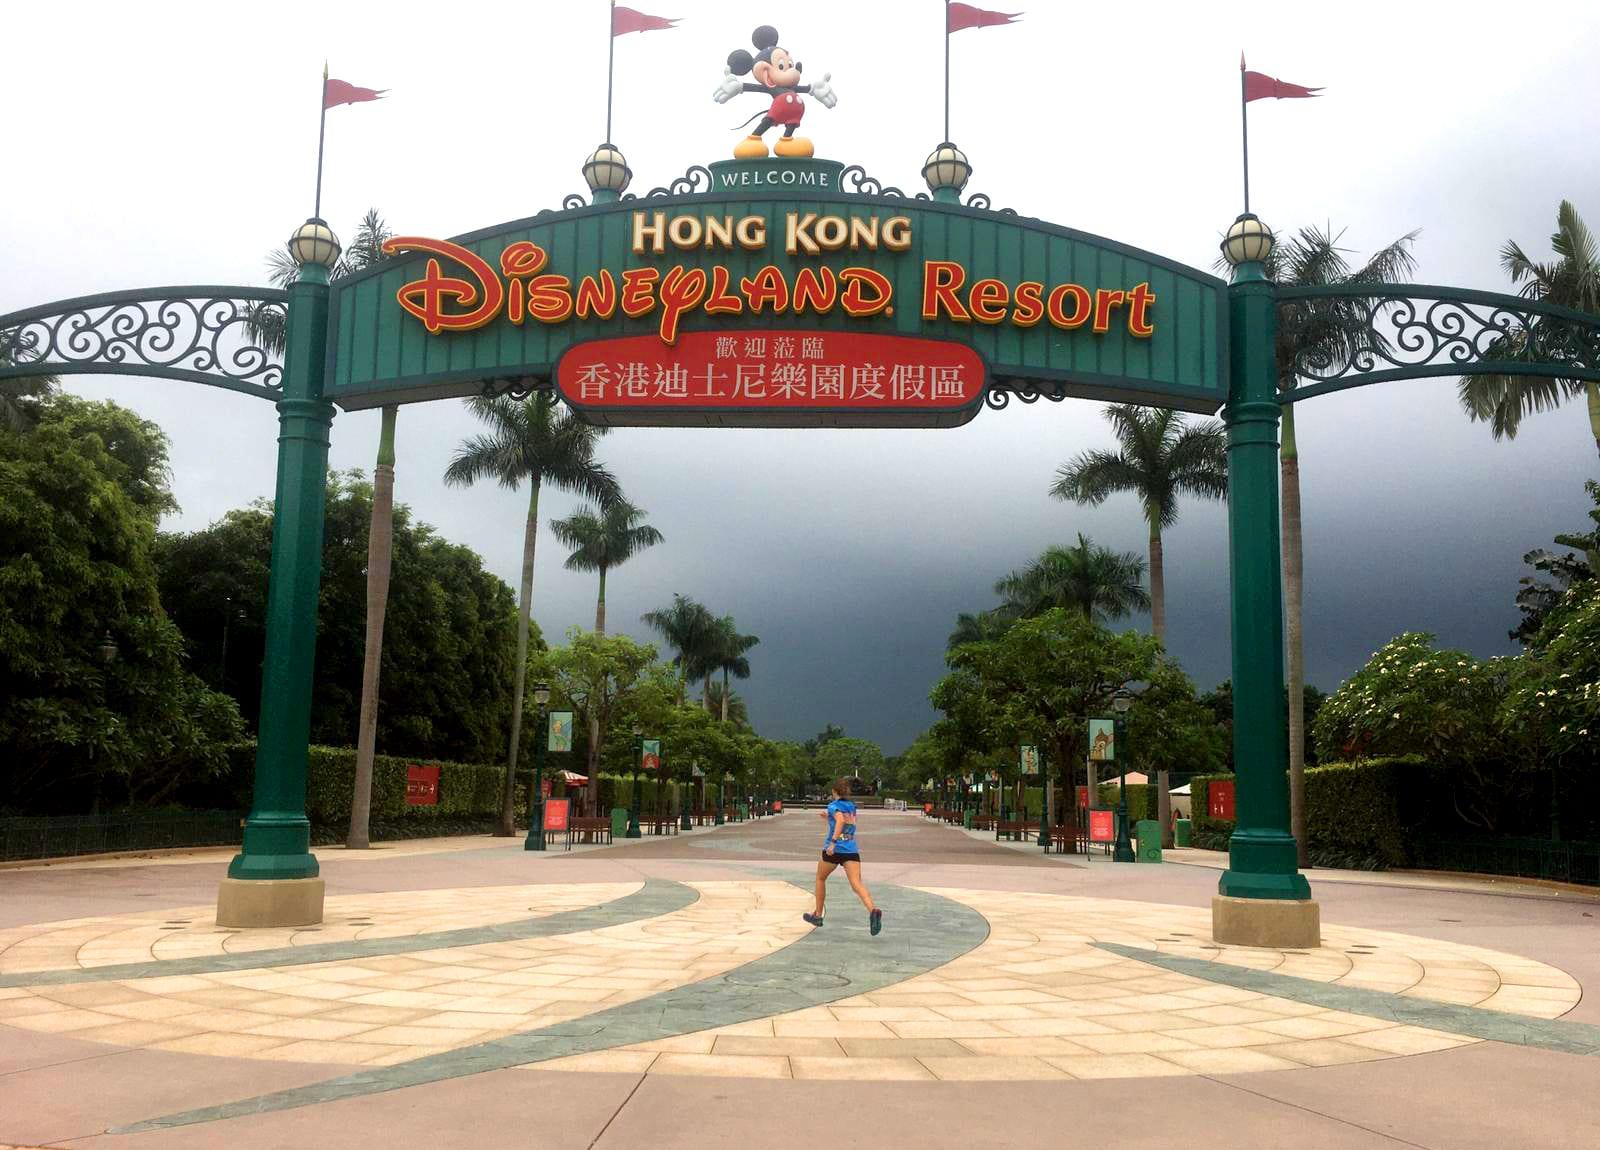 MTR HongKong Disney Resort Line